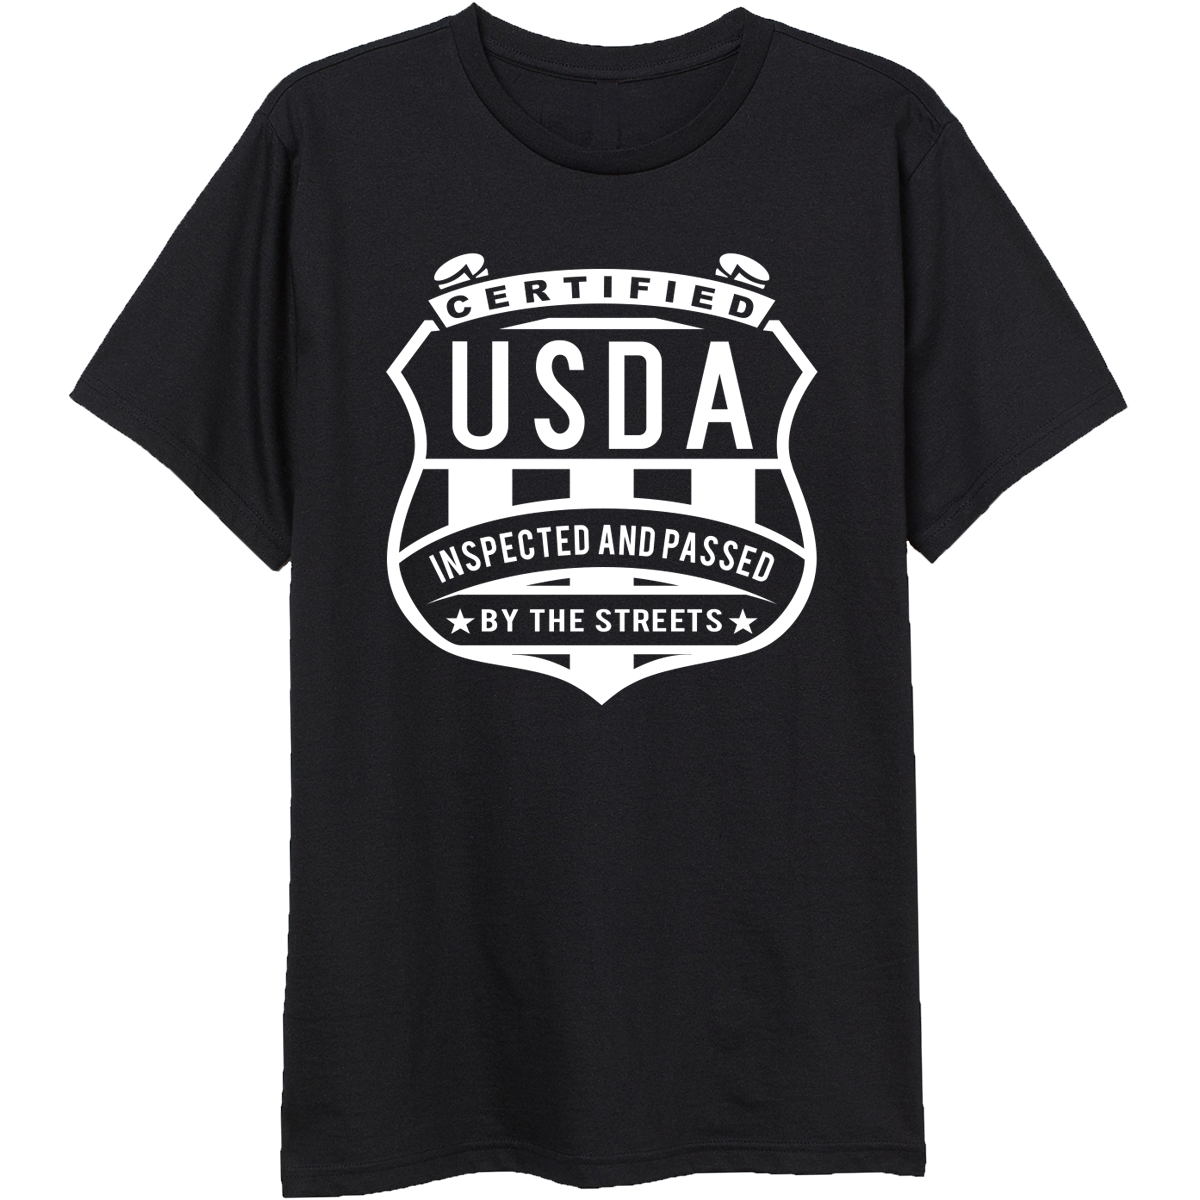 Certified USDA T-Shirt & TM104 Digital Download